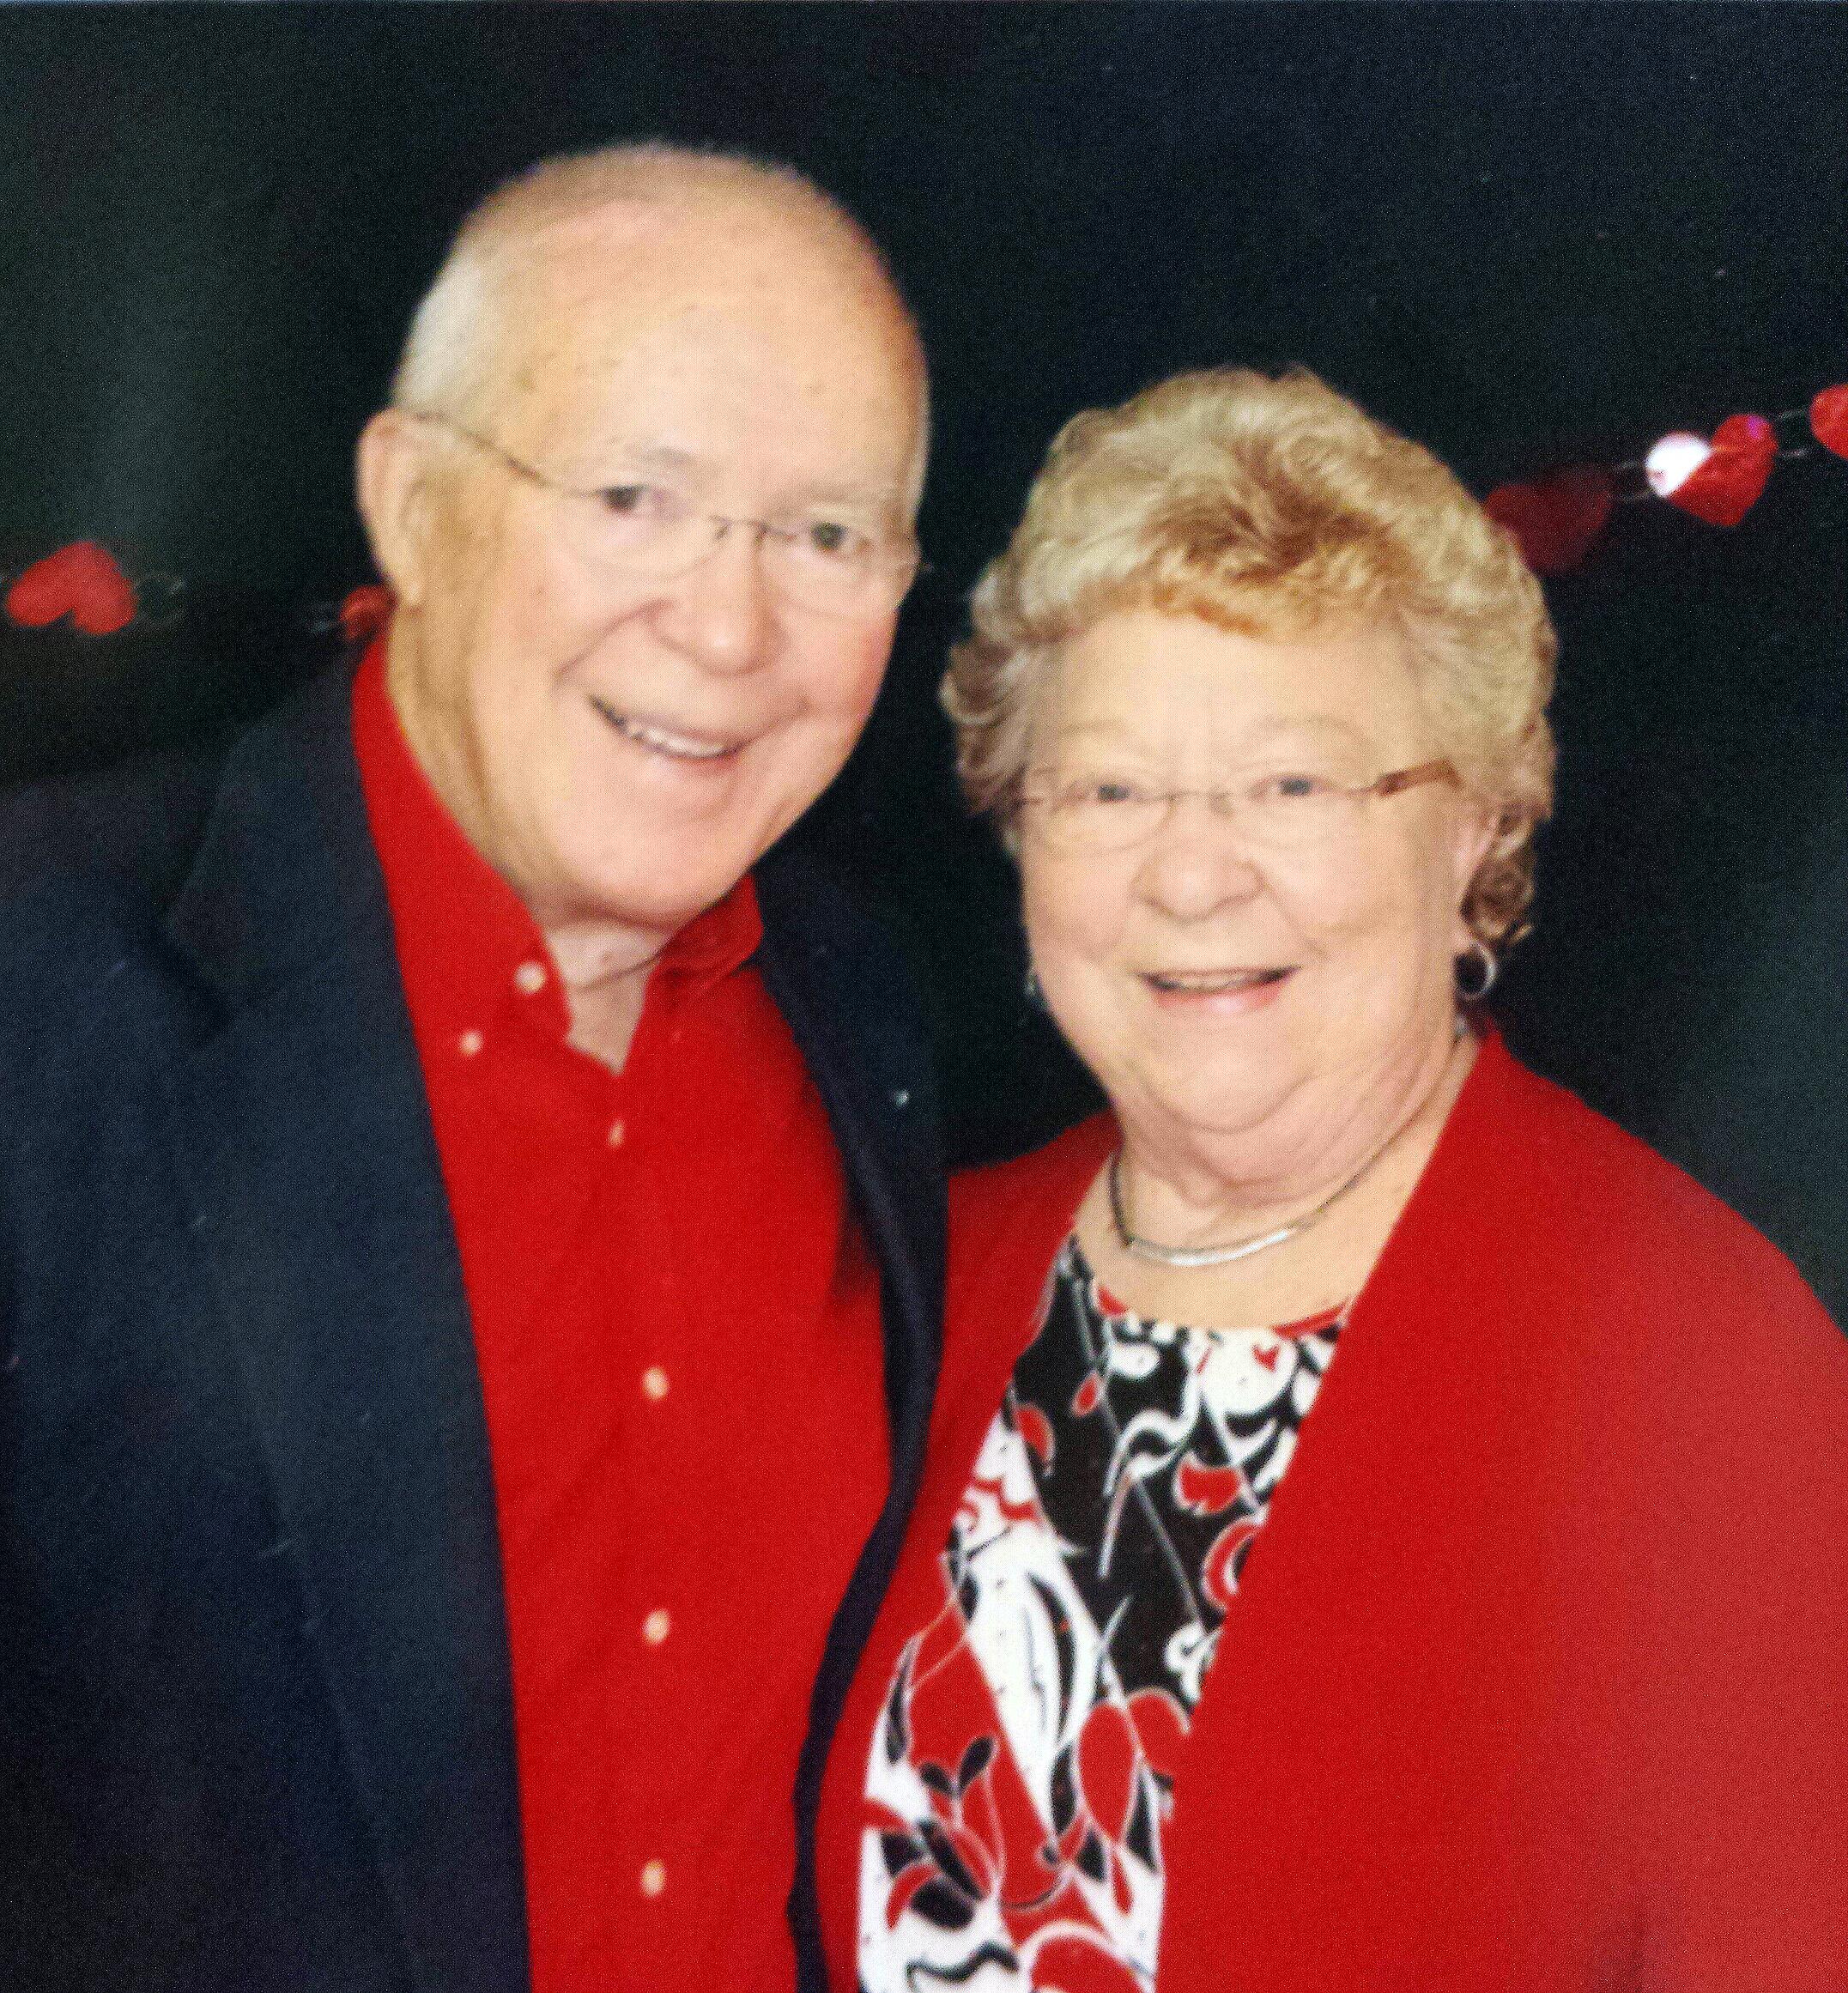 Arlon and Shirley Elser